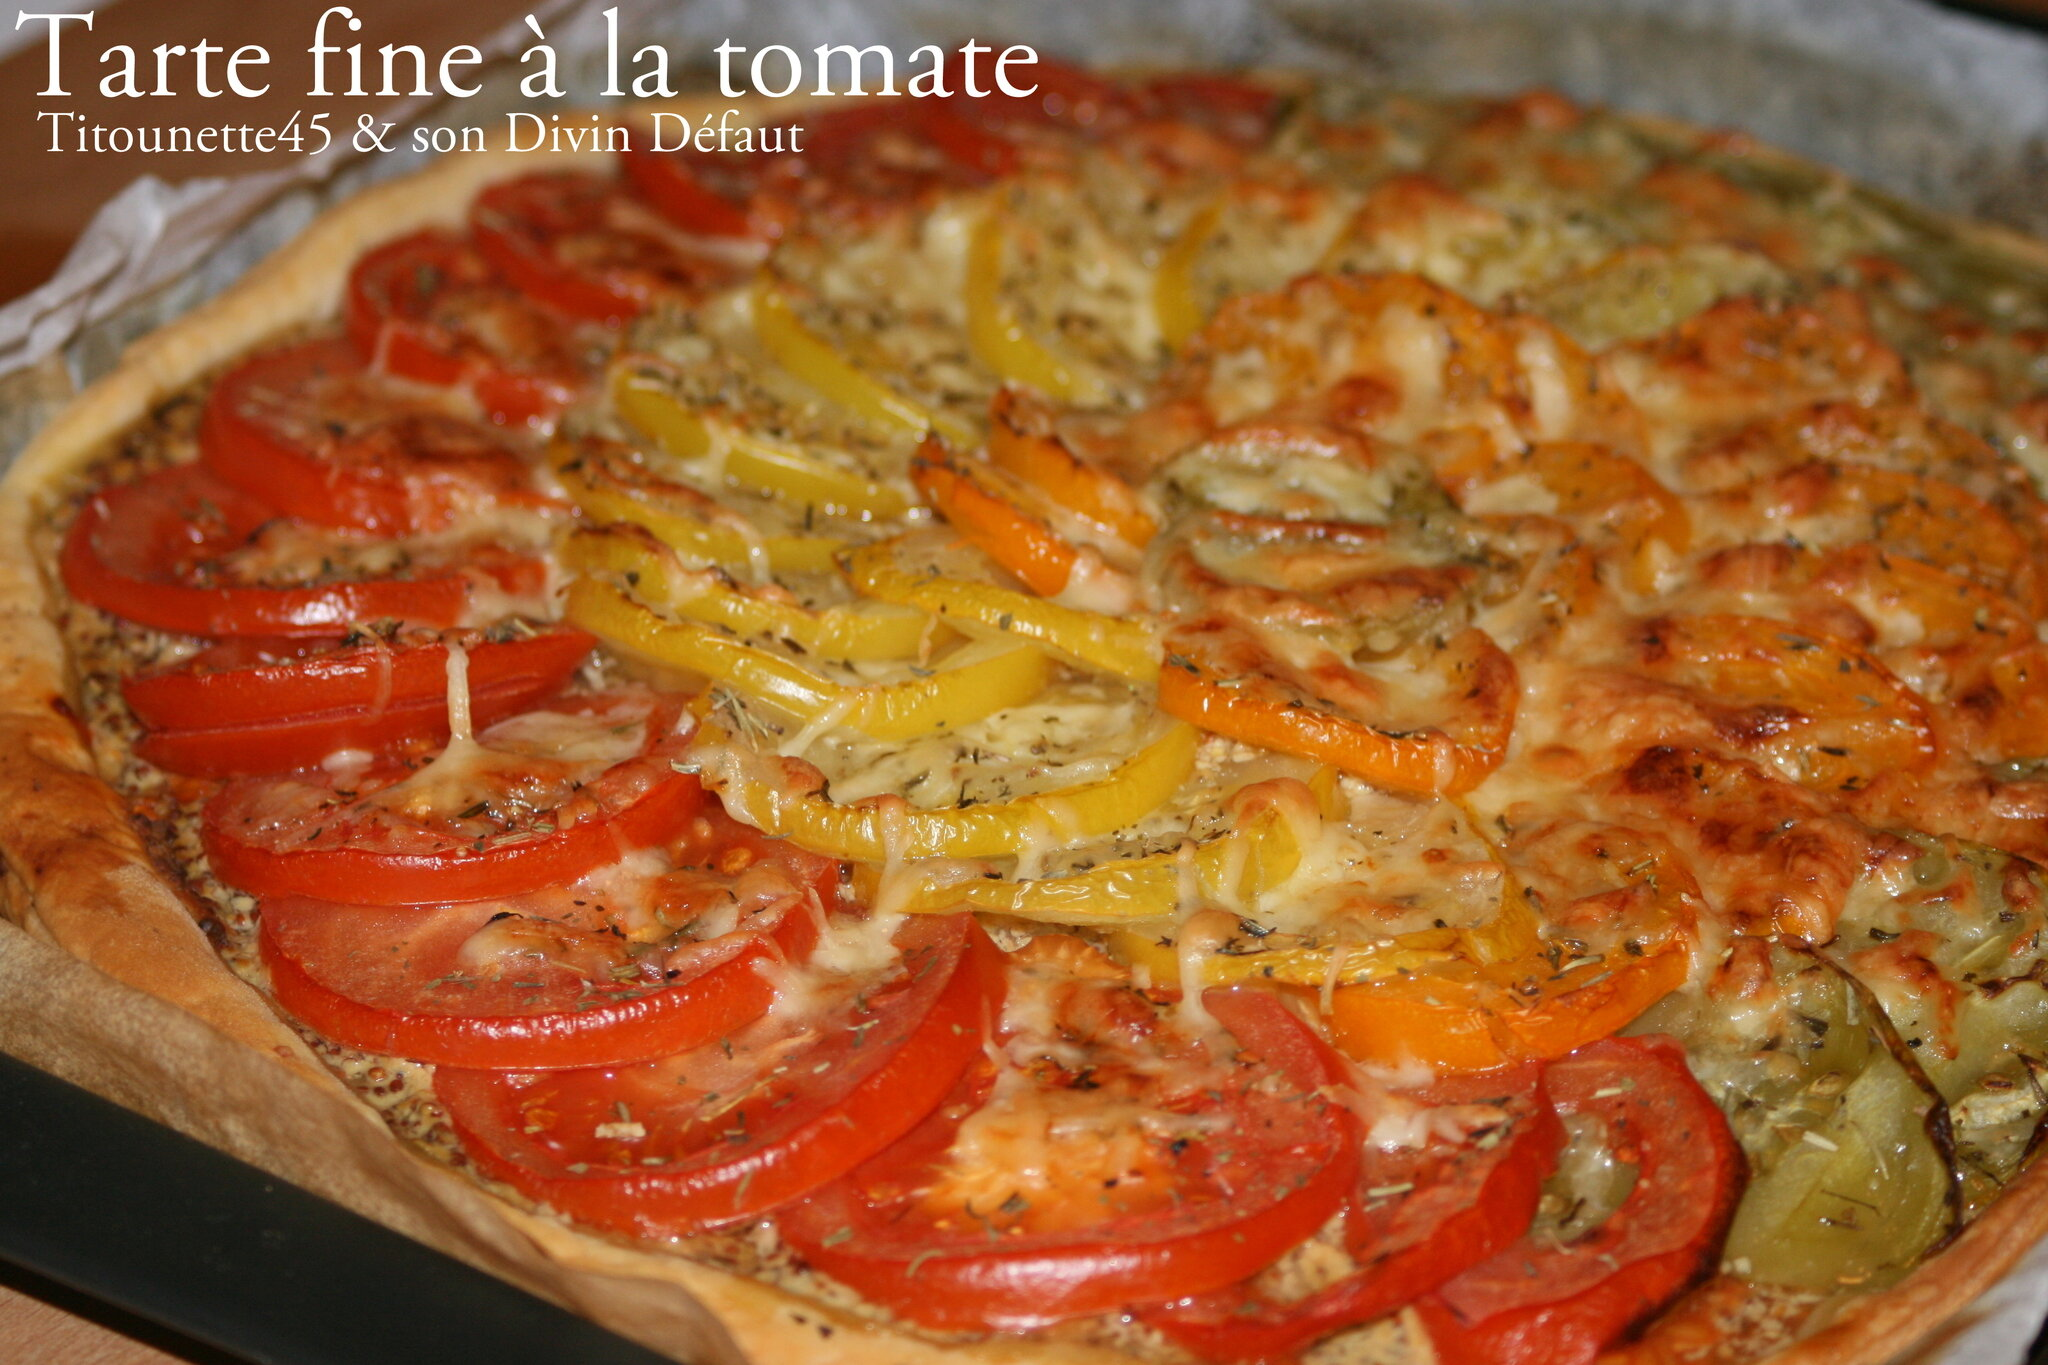 Tarte fine tomate Titounette45